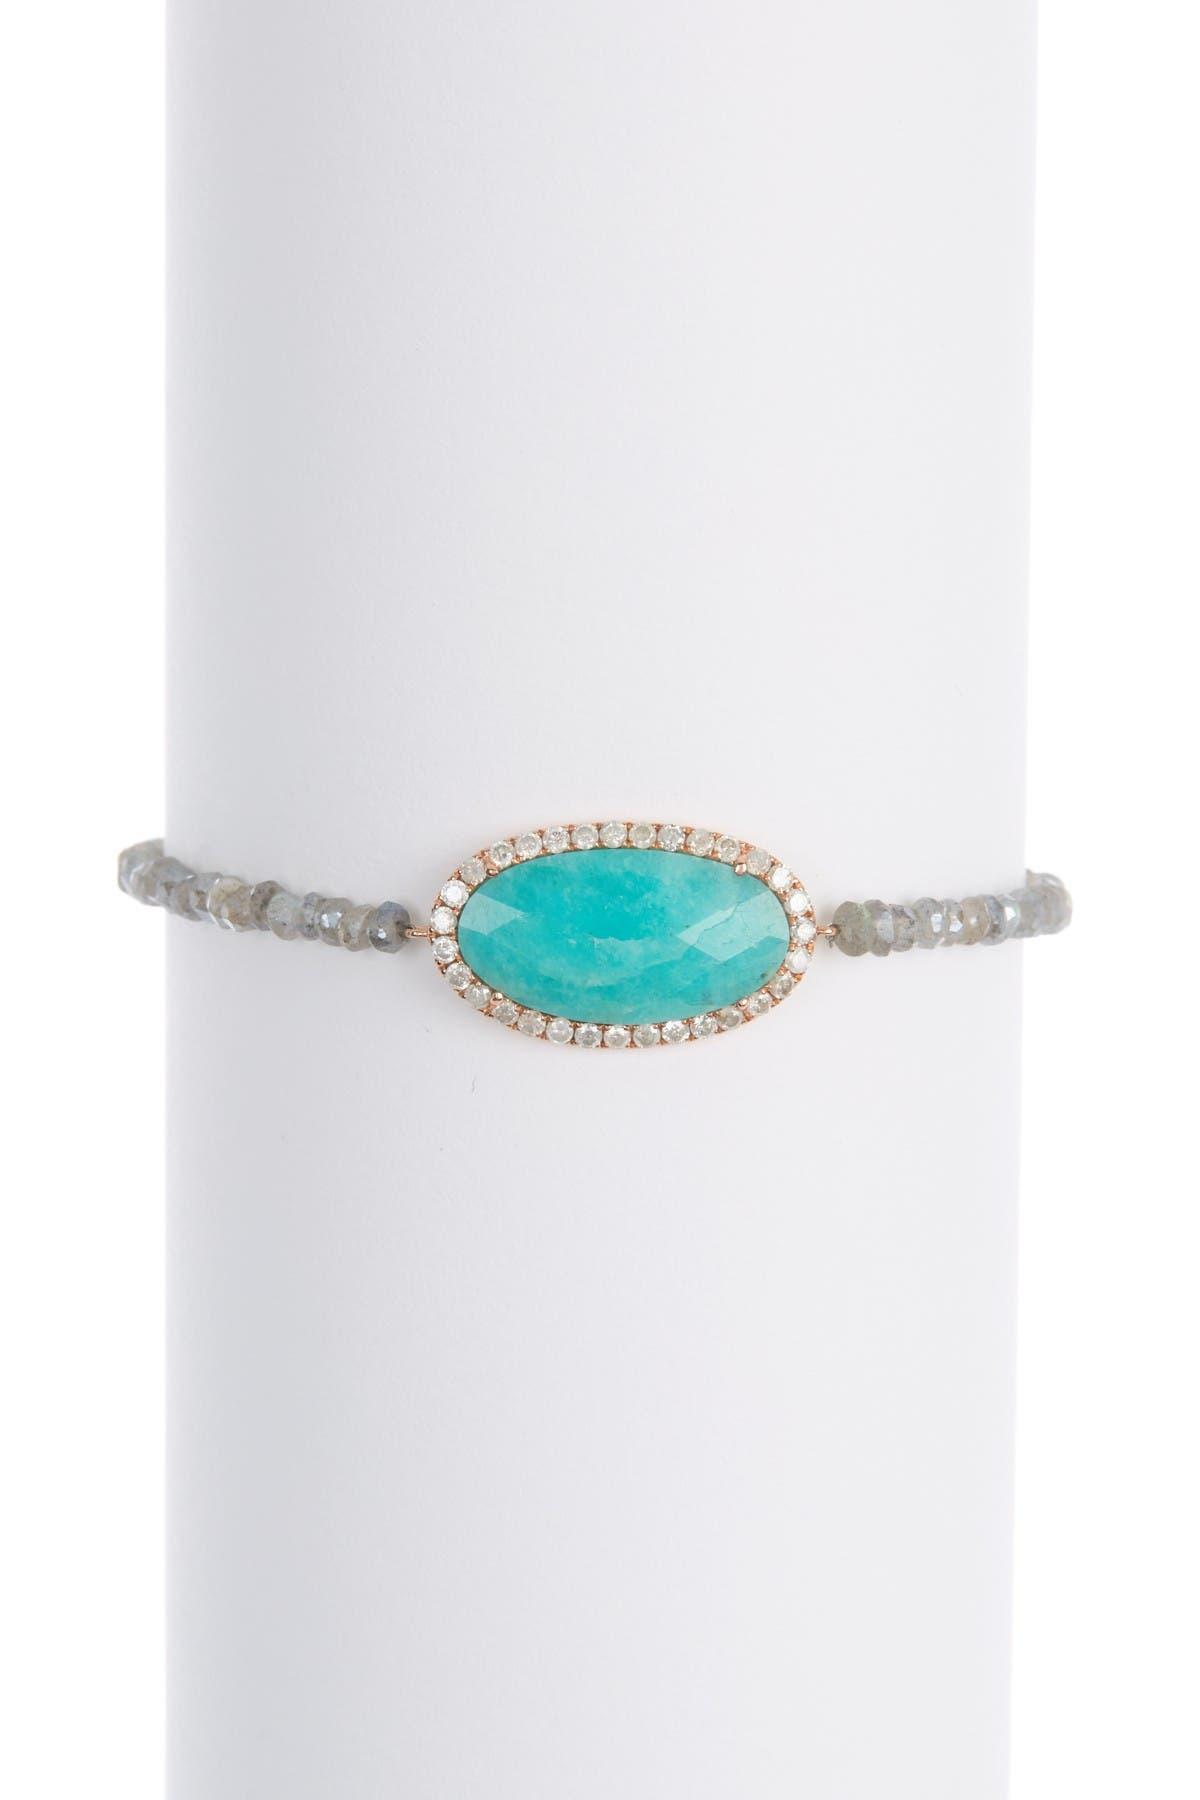 Image of Meira T 14K Rose Gold Blue Amazonite & Pave Diamond Halo Beaded Labradorite Bracelet